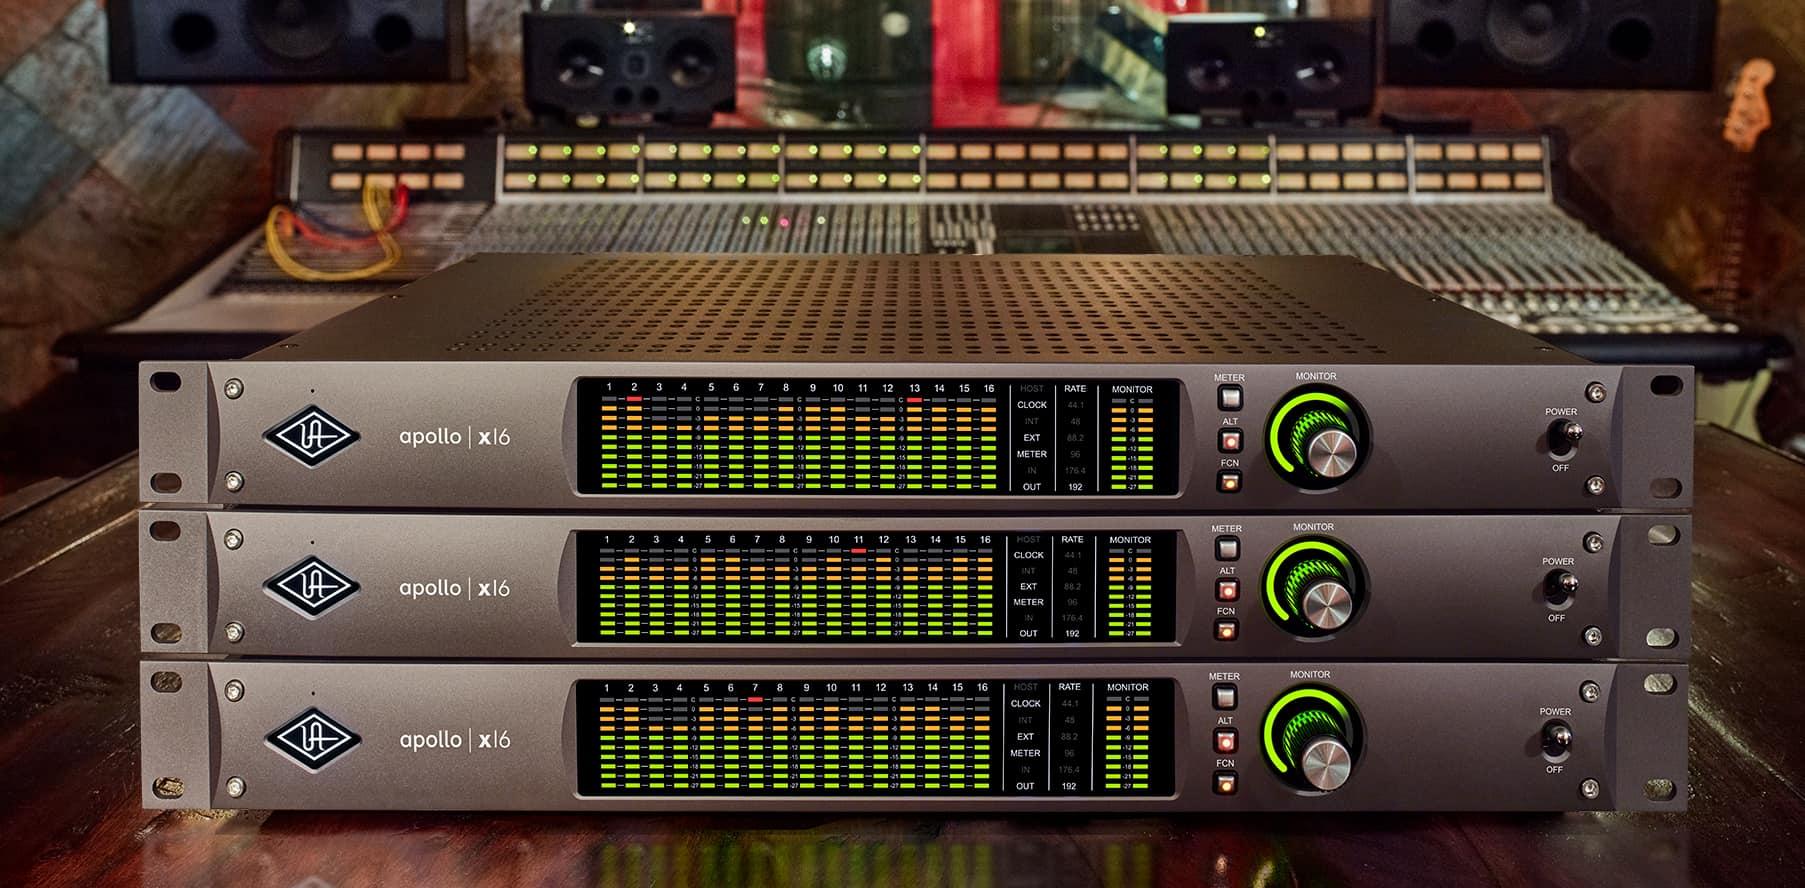 Top News: Universal Audio Apollo X6, X8, X8p, X16